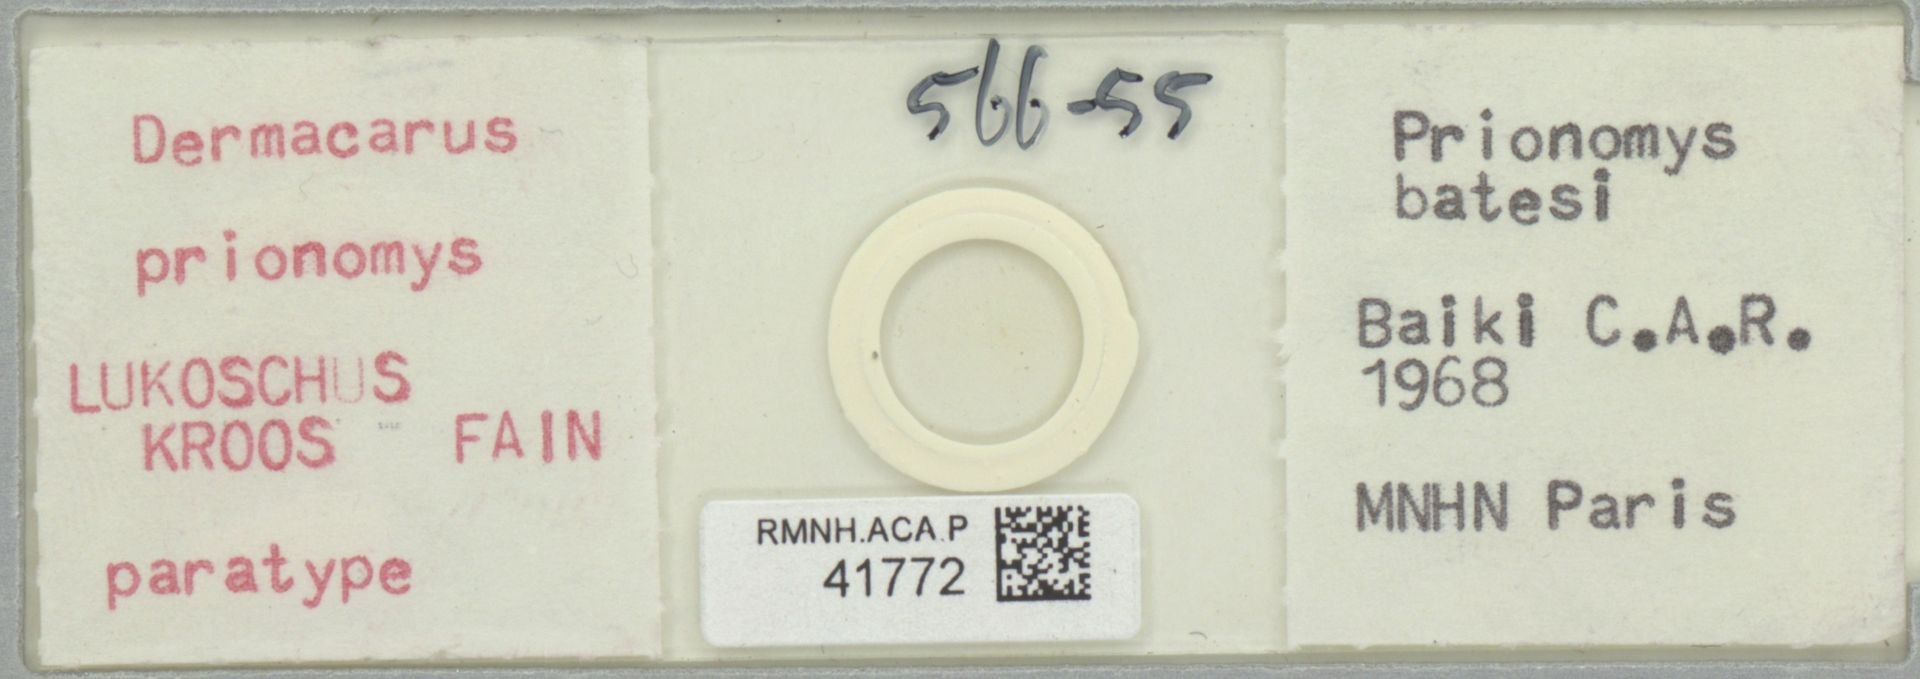 RMNH.ACA.P.41772 | Dermacarus prionomys Lukoschus, Kroos, Fain